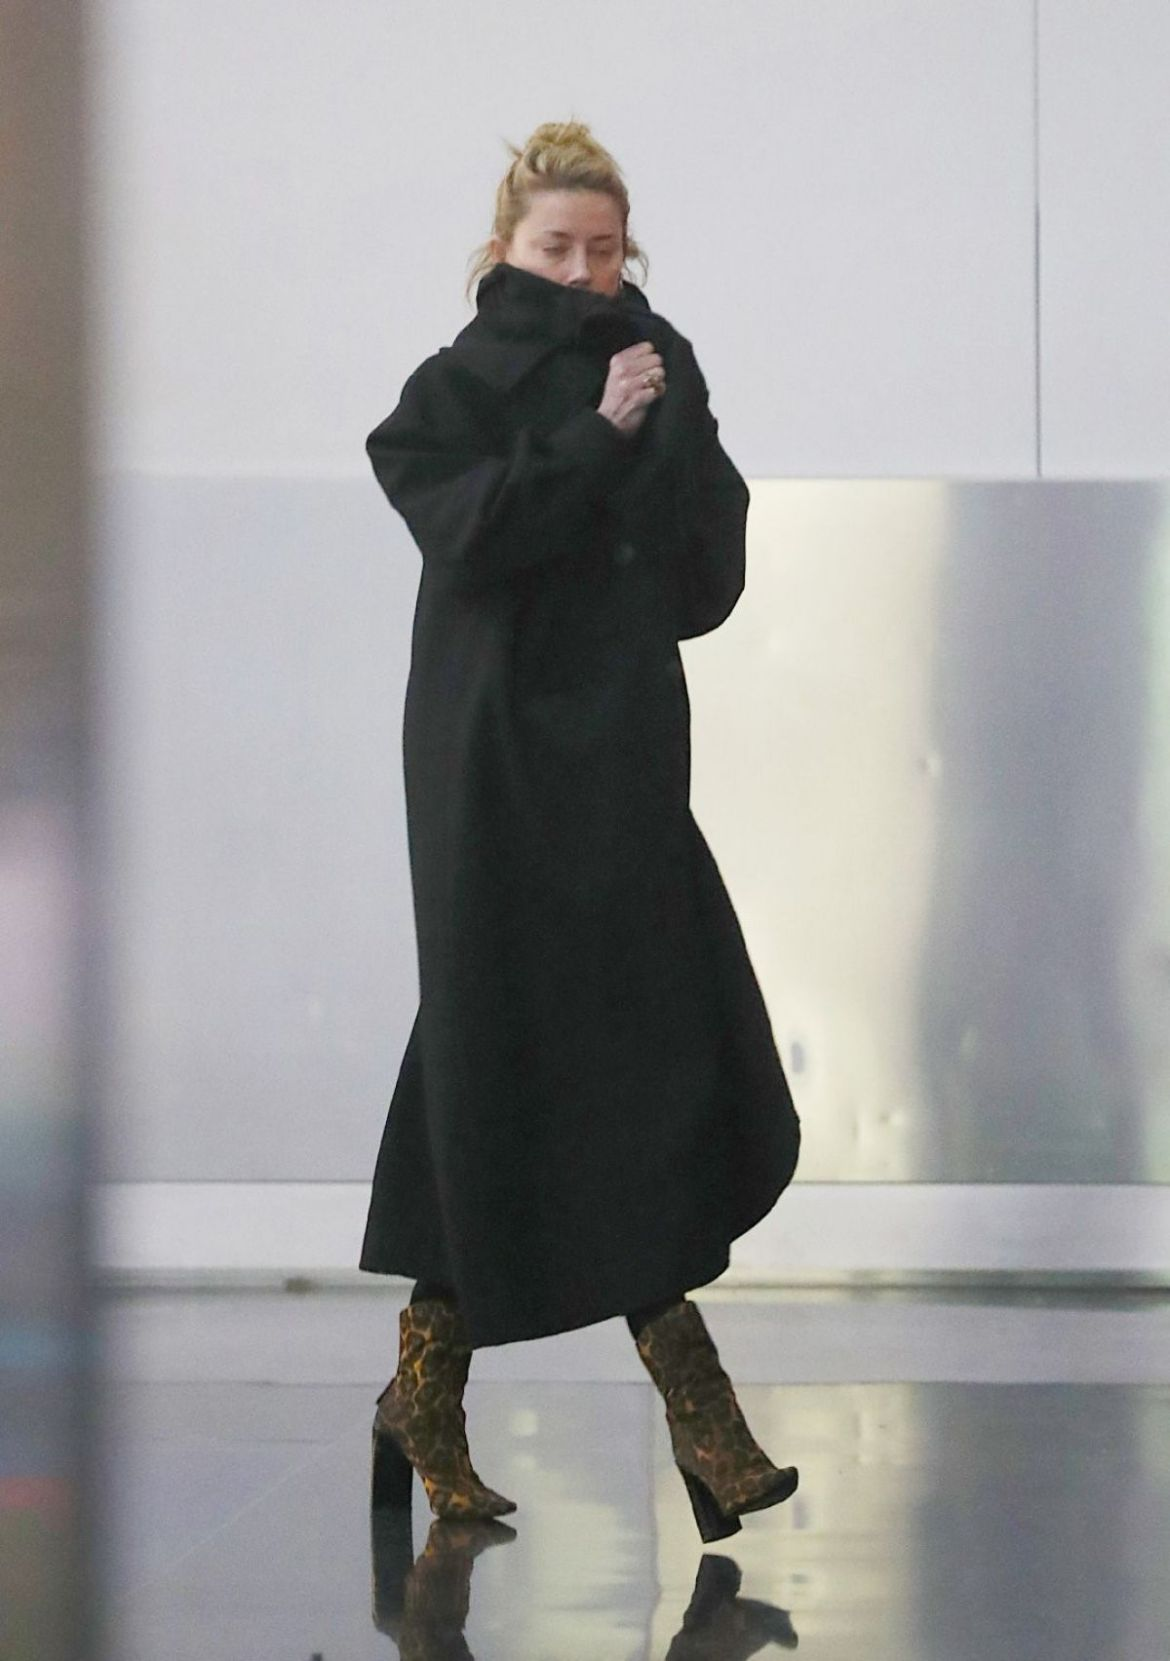 AMBER HEARD at JFK Airport in New York 11/29/2018